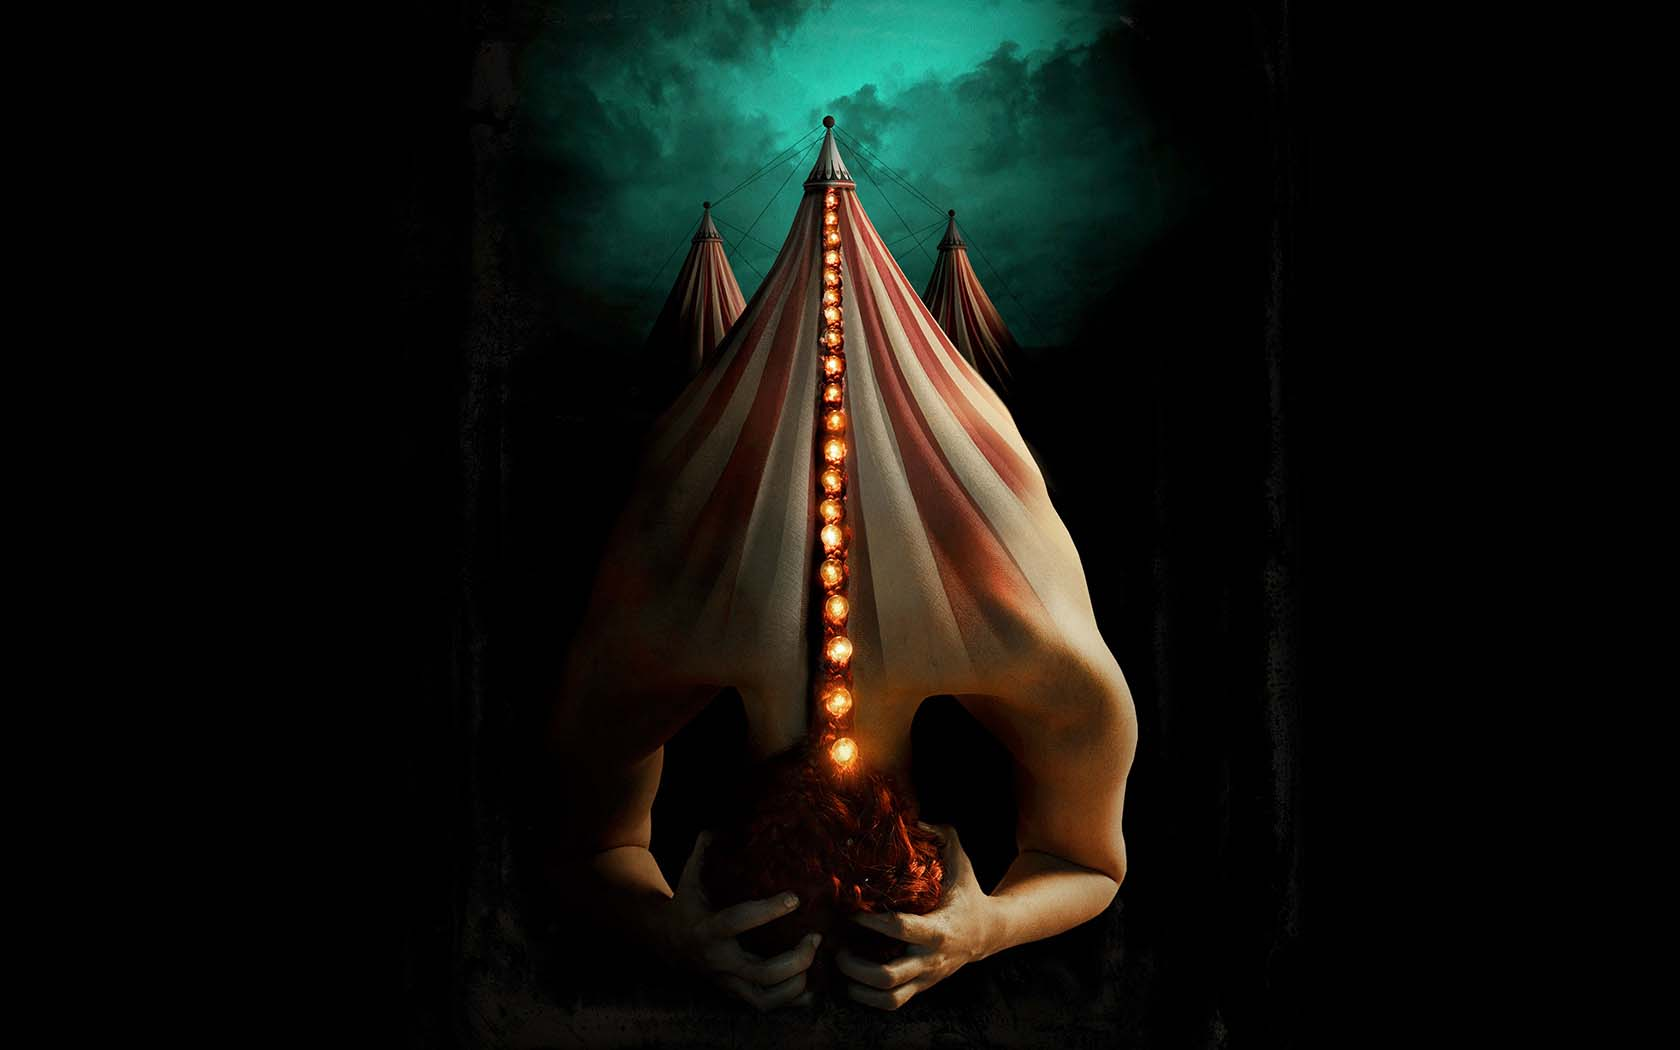 American Horror Story: Freak Показать